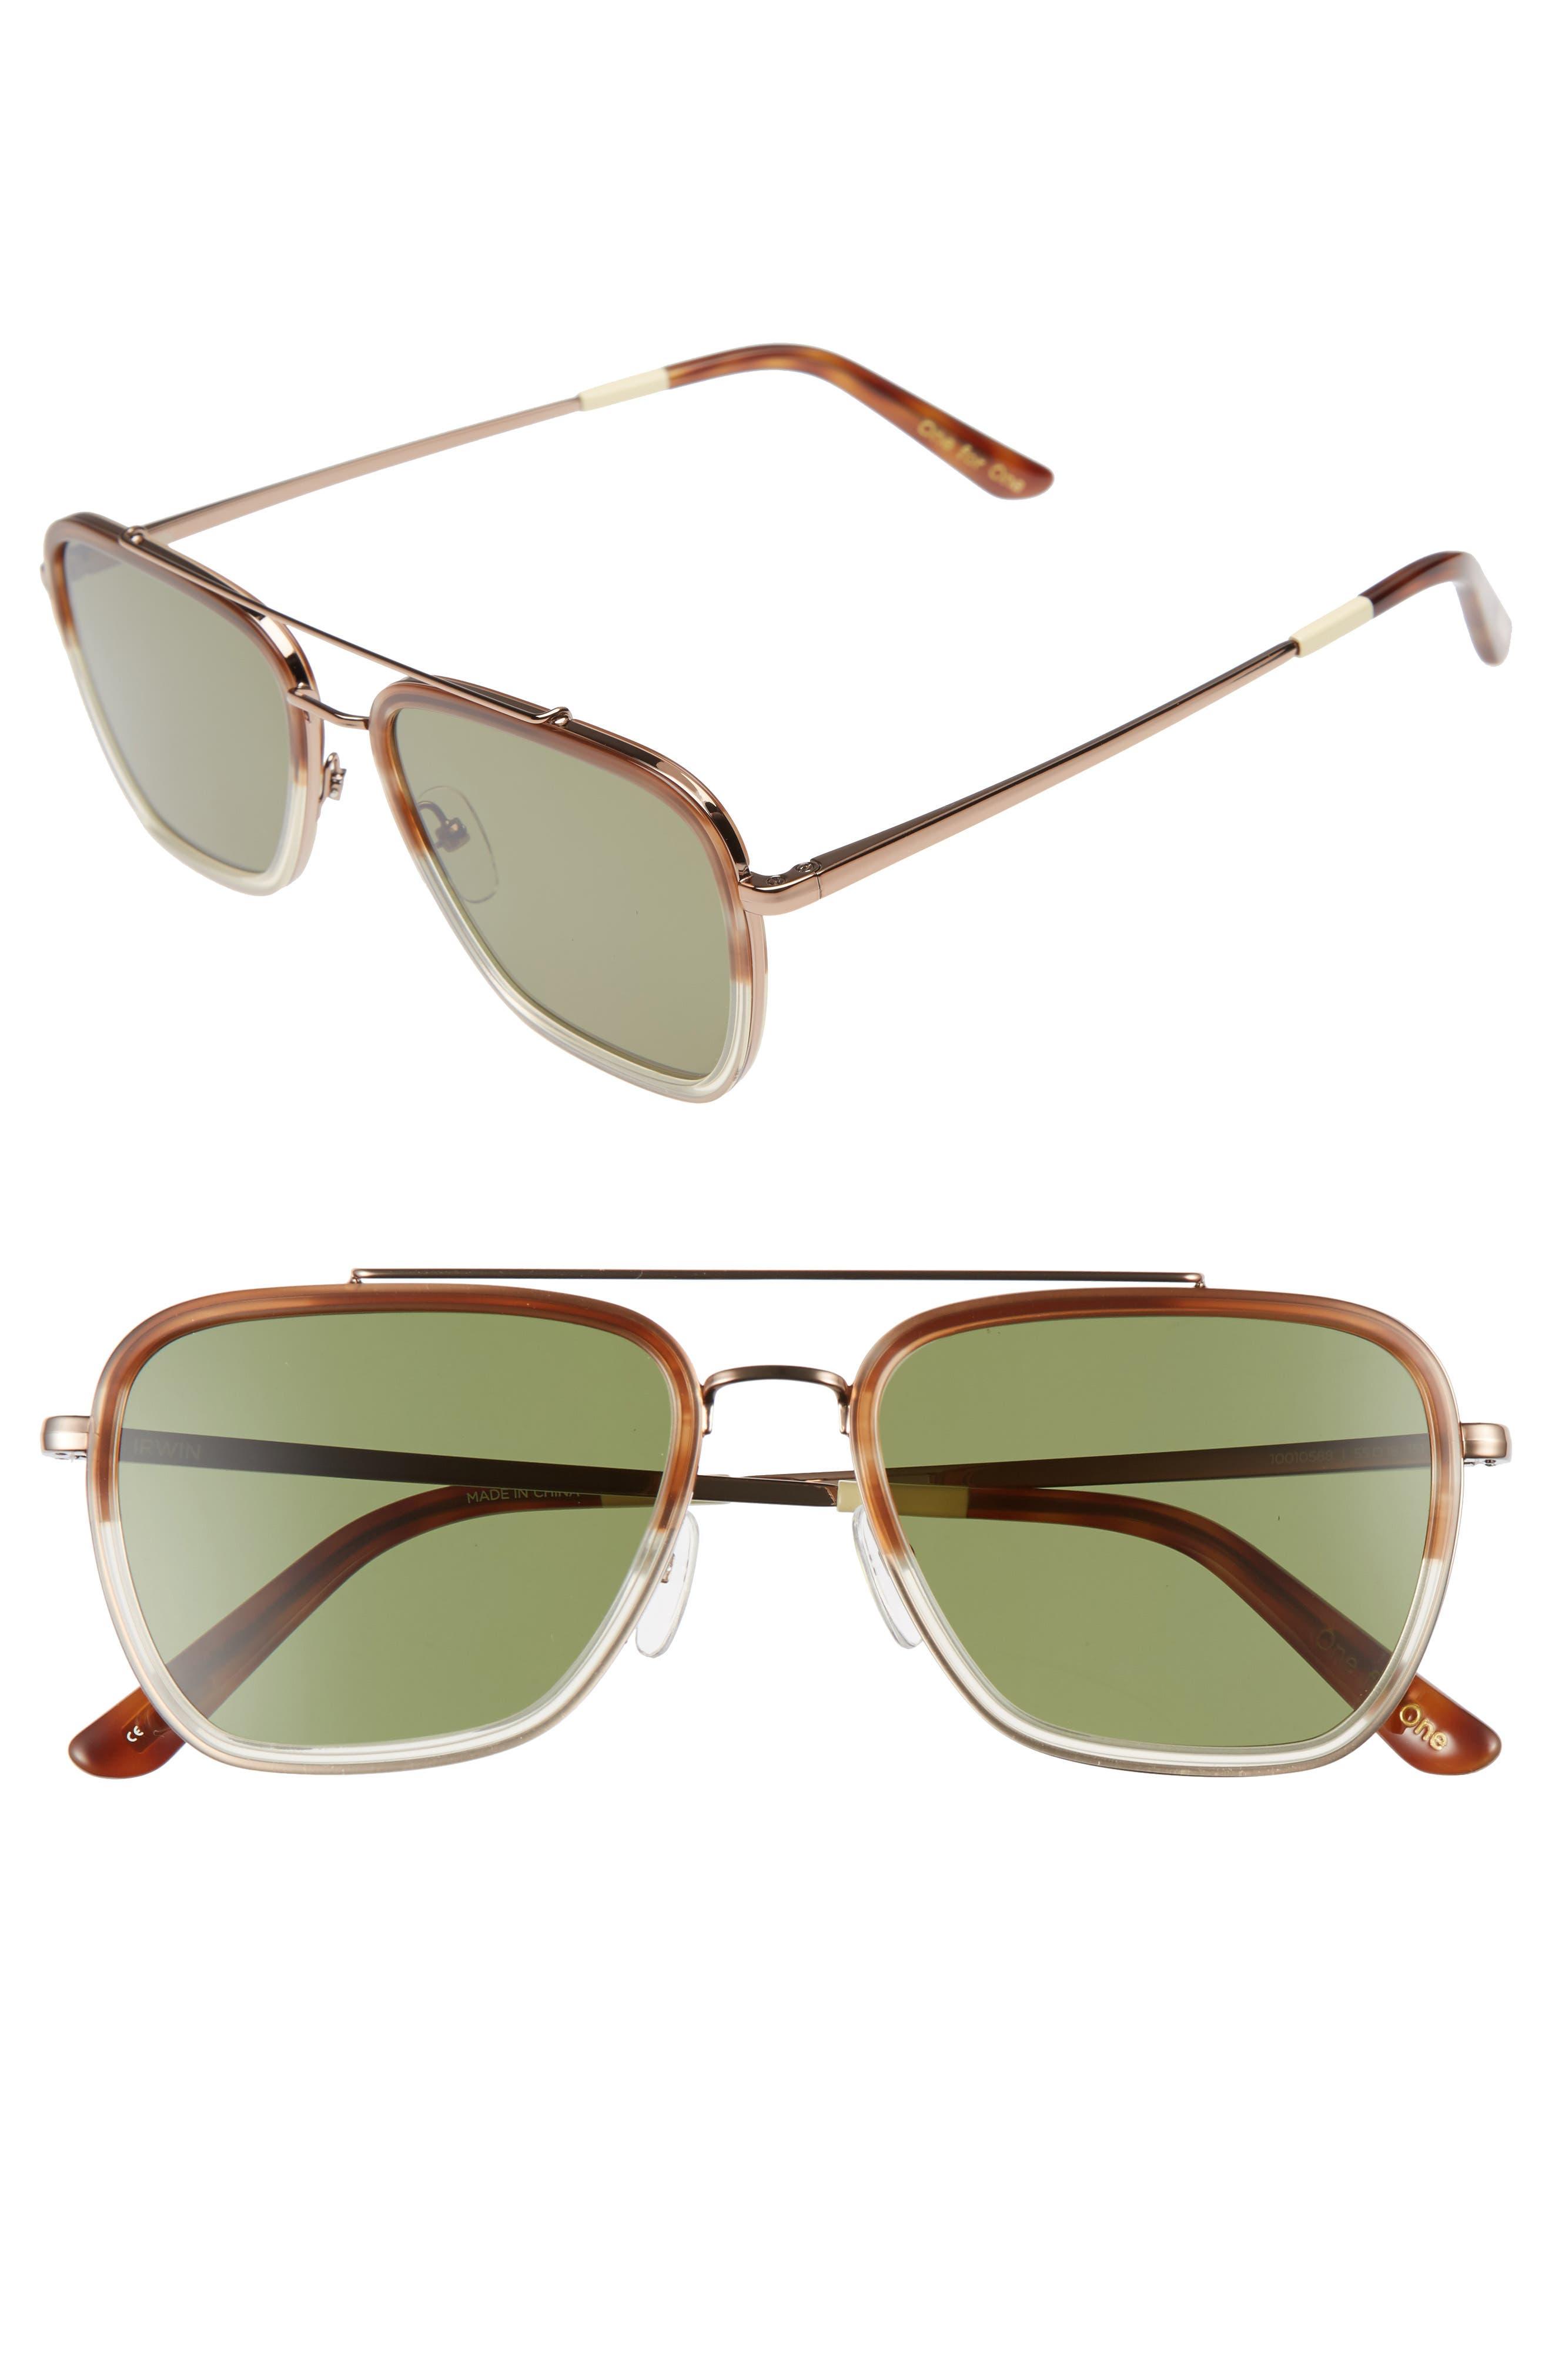 Retro Sunglasses | Vintage Glasses | New Vintage Eyeglasses Mens Toms Irwin 55Mm Sunglasses - Whiskey Tort $169.00 AT vintagedancer.com